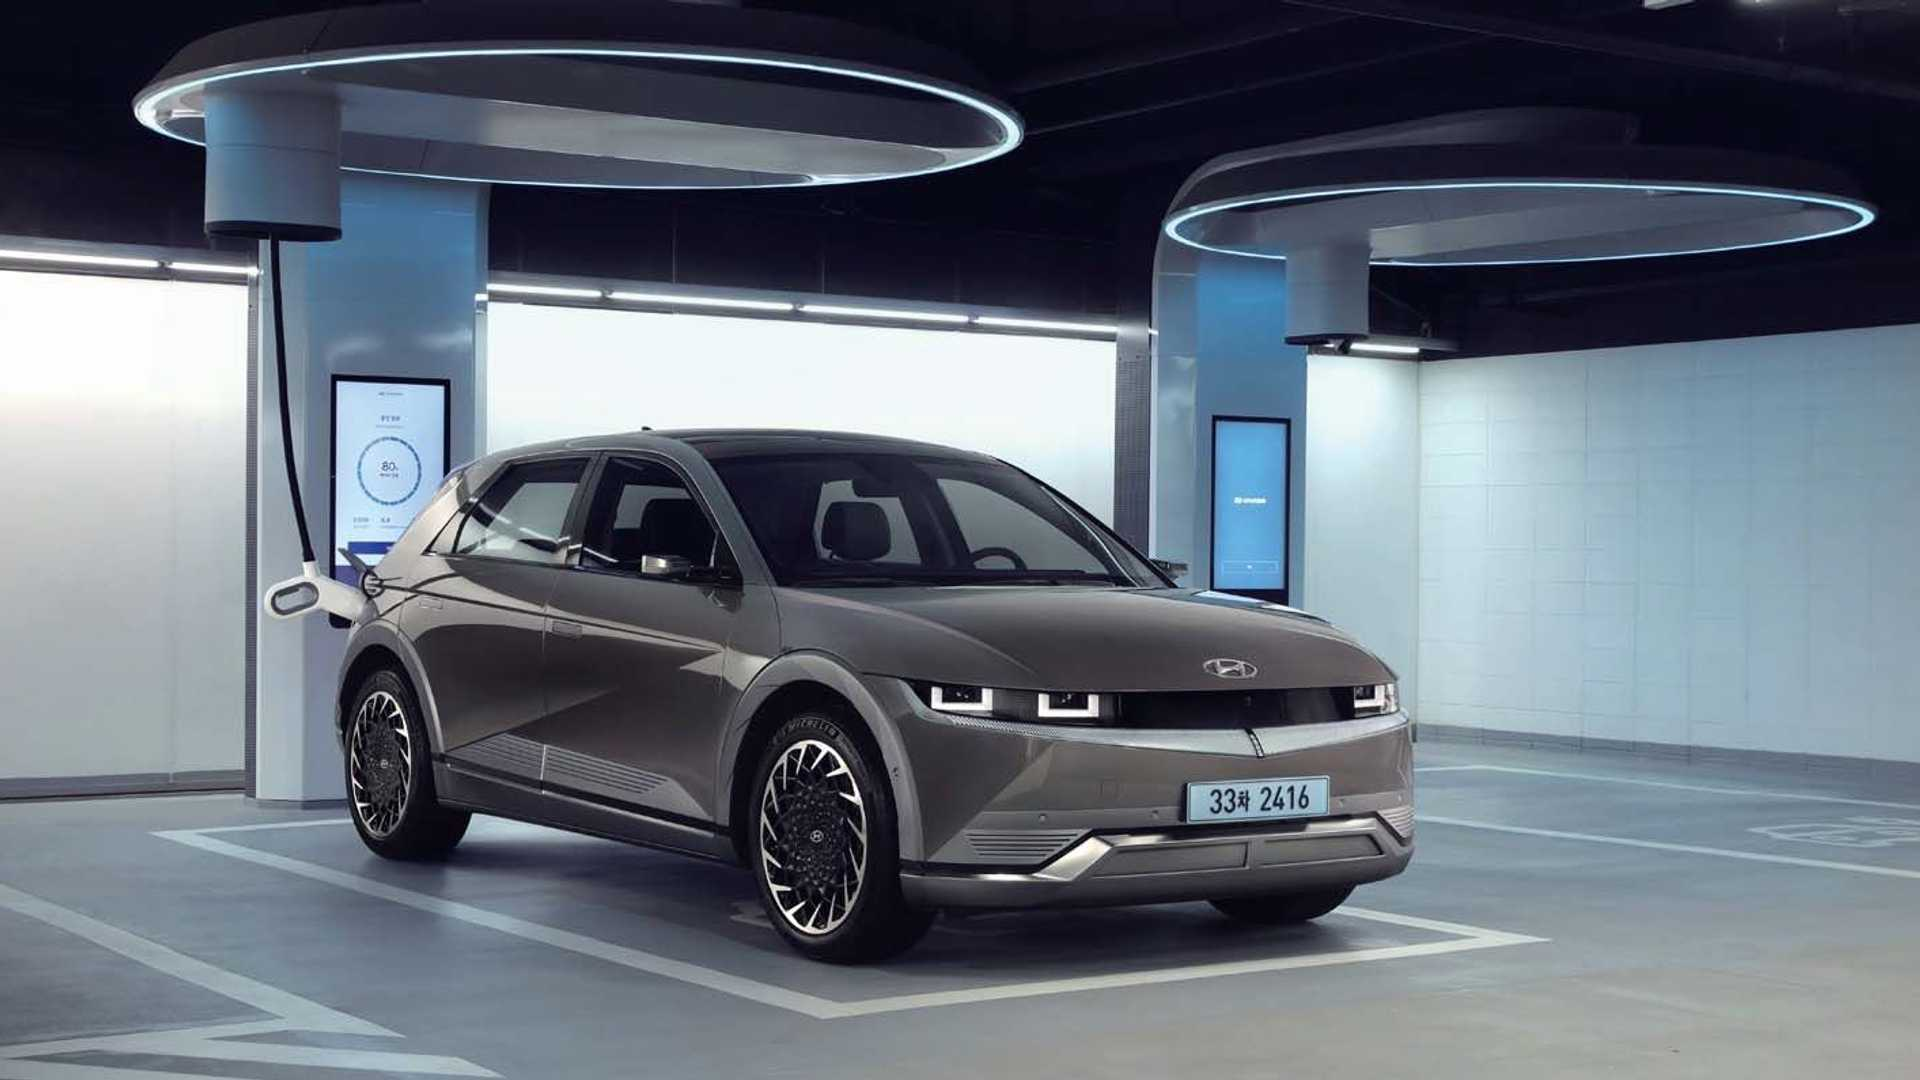 Hyundai Ioniq 5 DC Fast Charging Analysis: It Seems Impressive